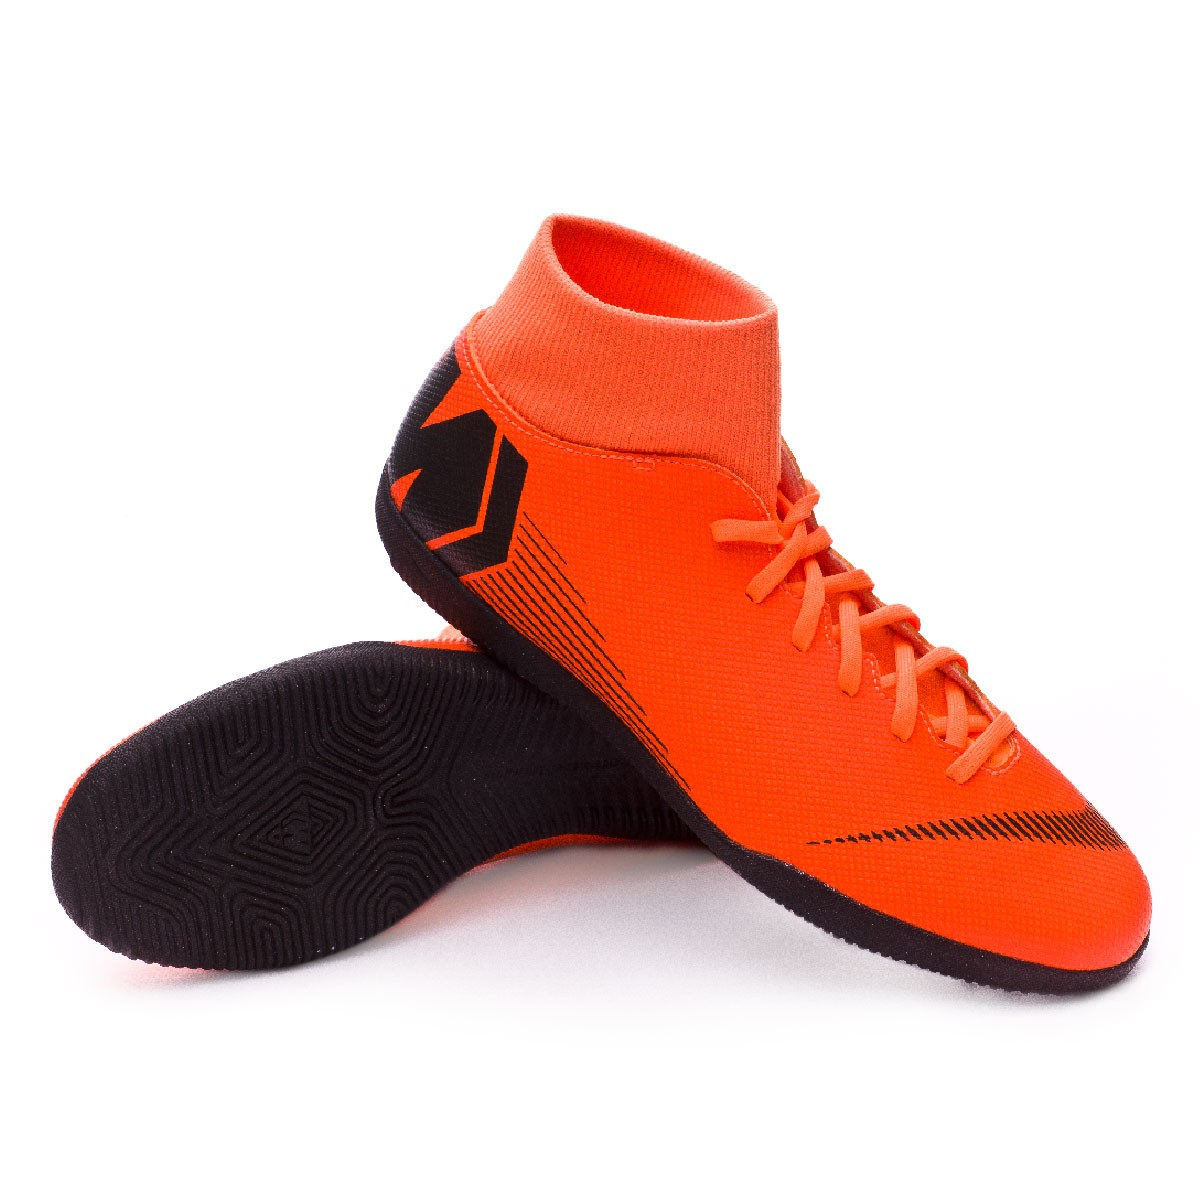 0f950200c785 Futsal Boot Nike Mercurial SuperflyX VI Club IC Total orange-Black ...